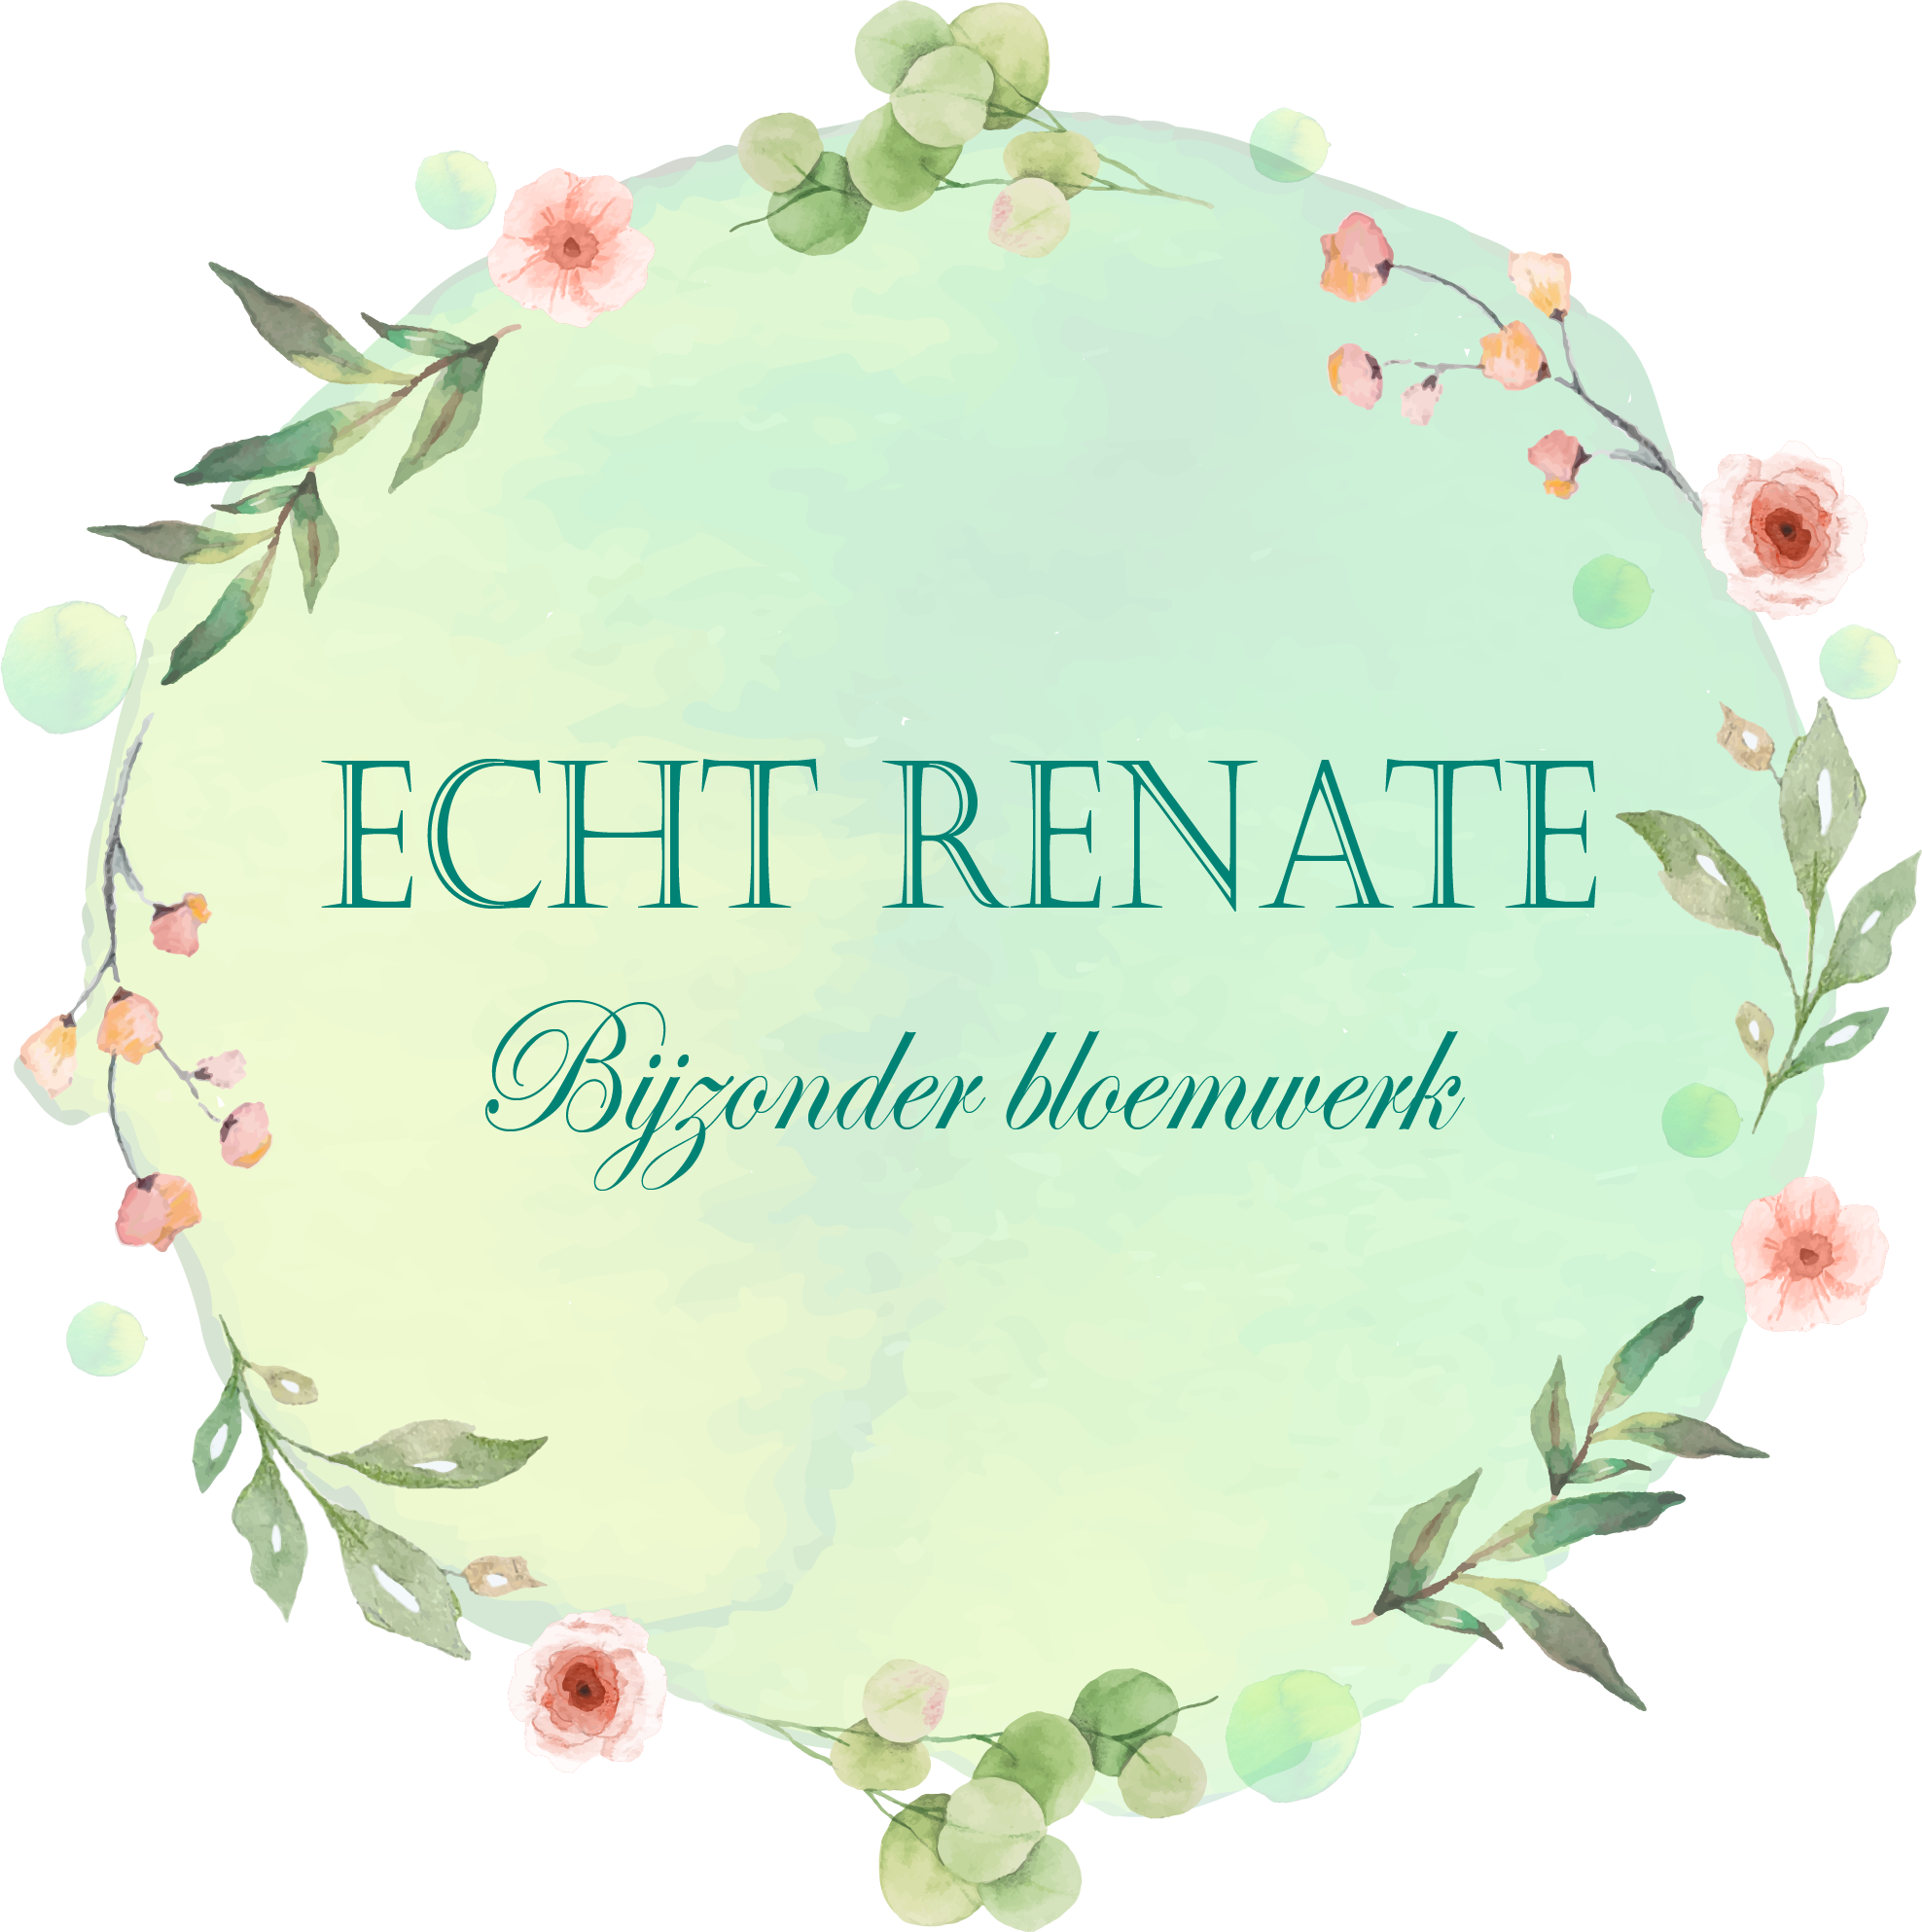 Echt-Renate-1a-logo-aqua-1